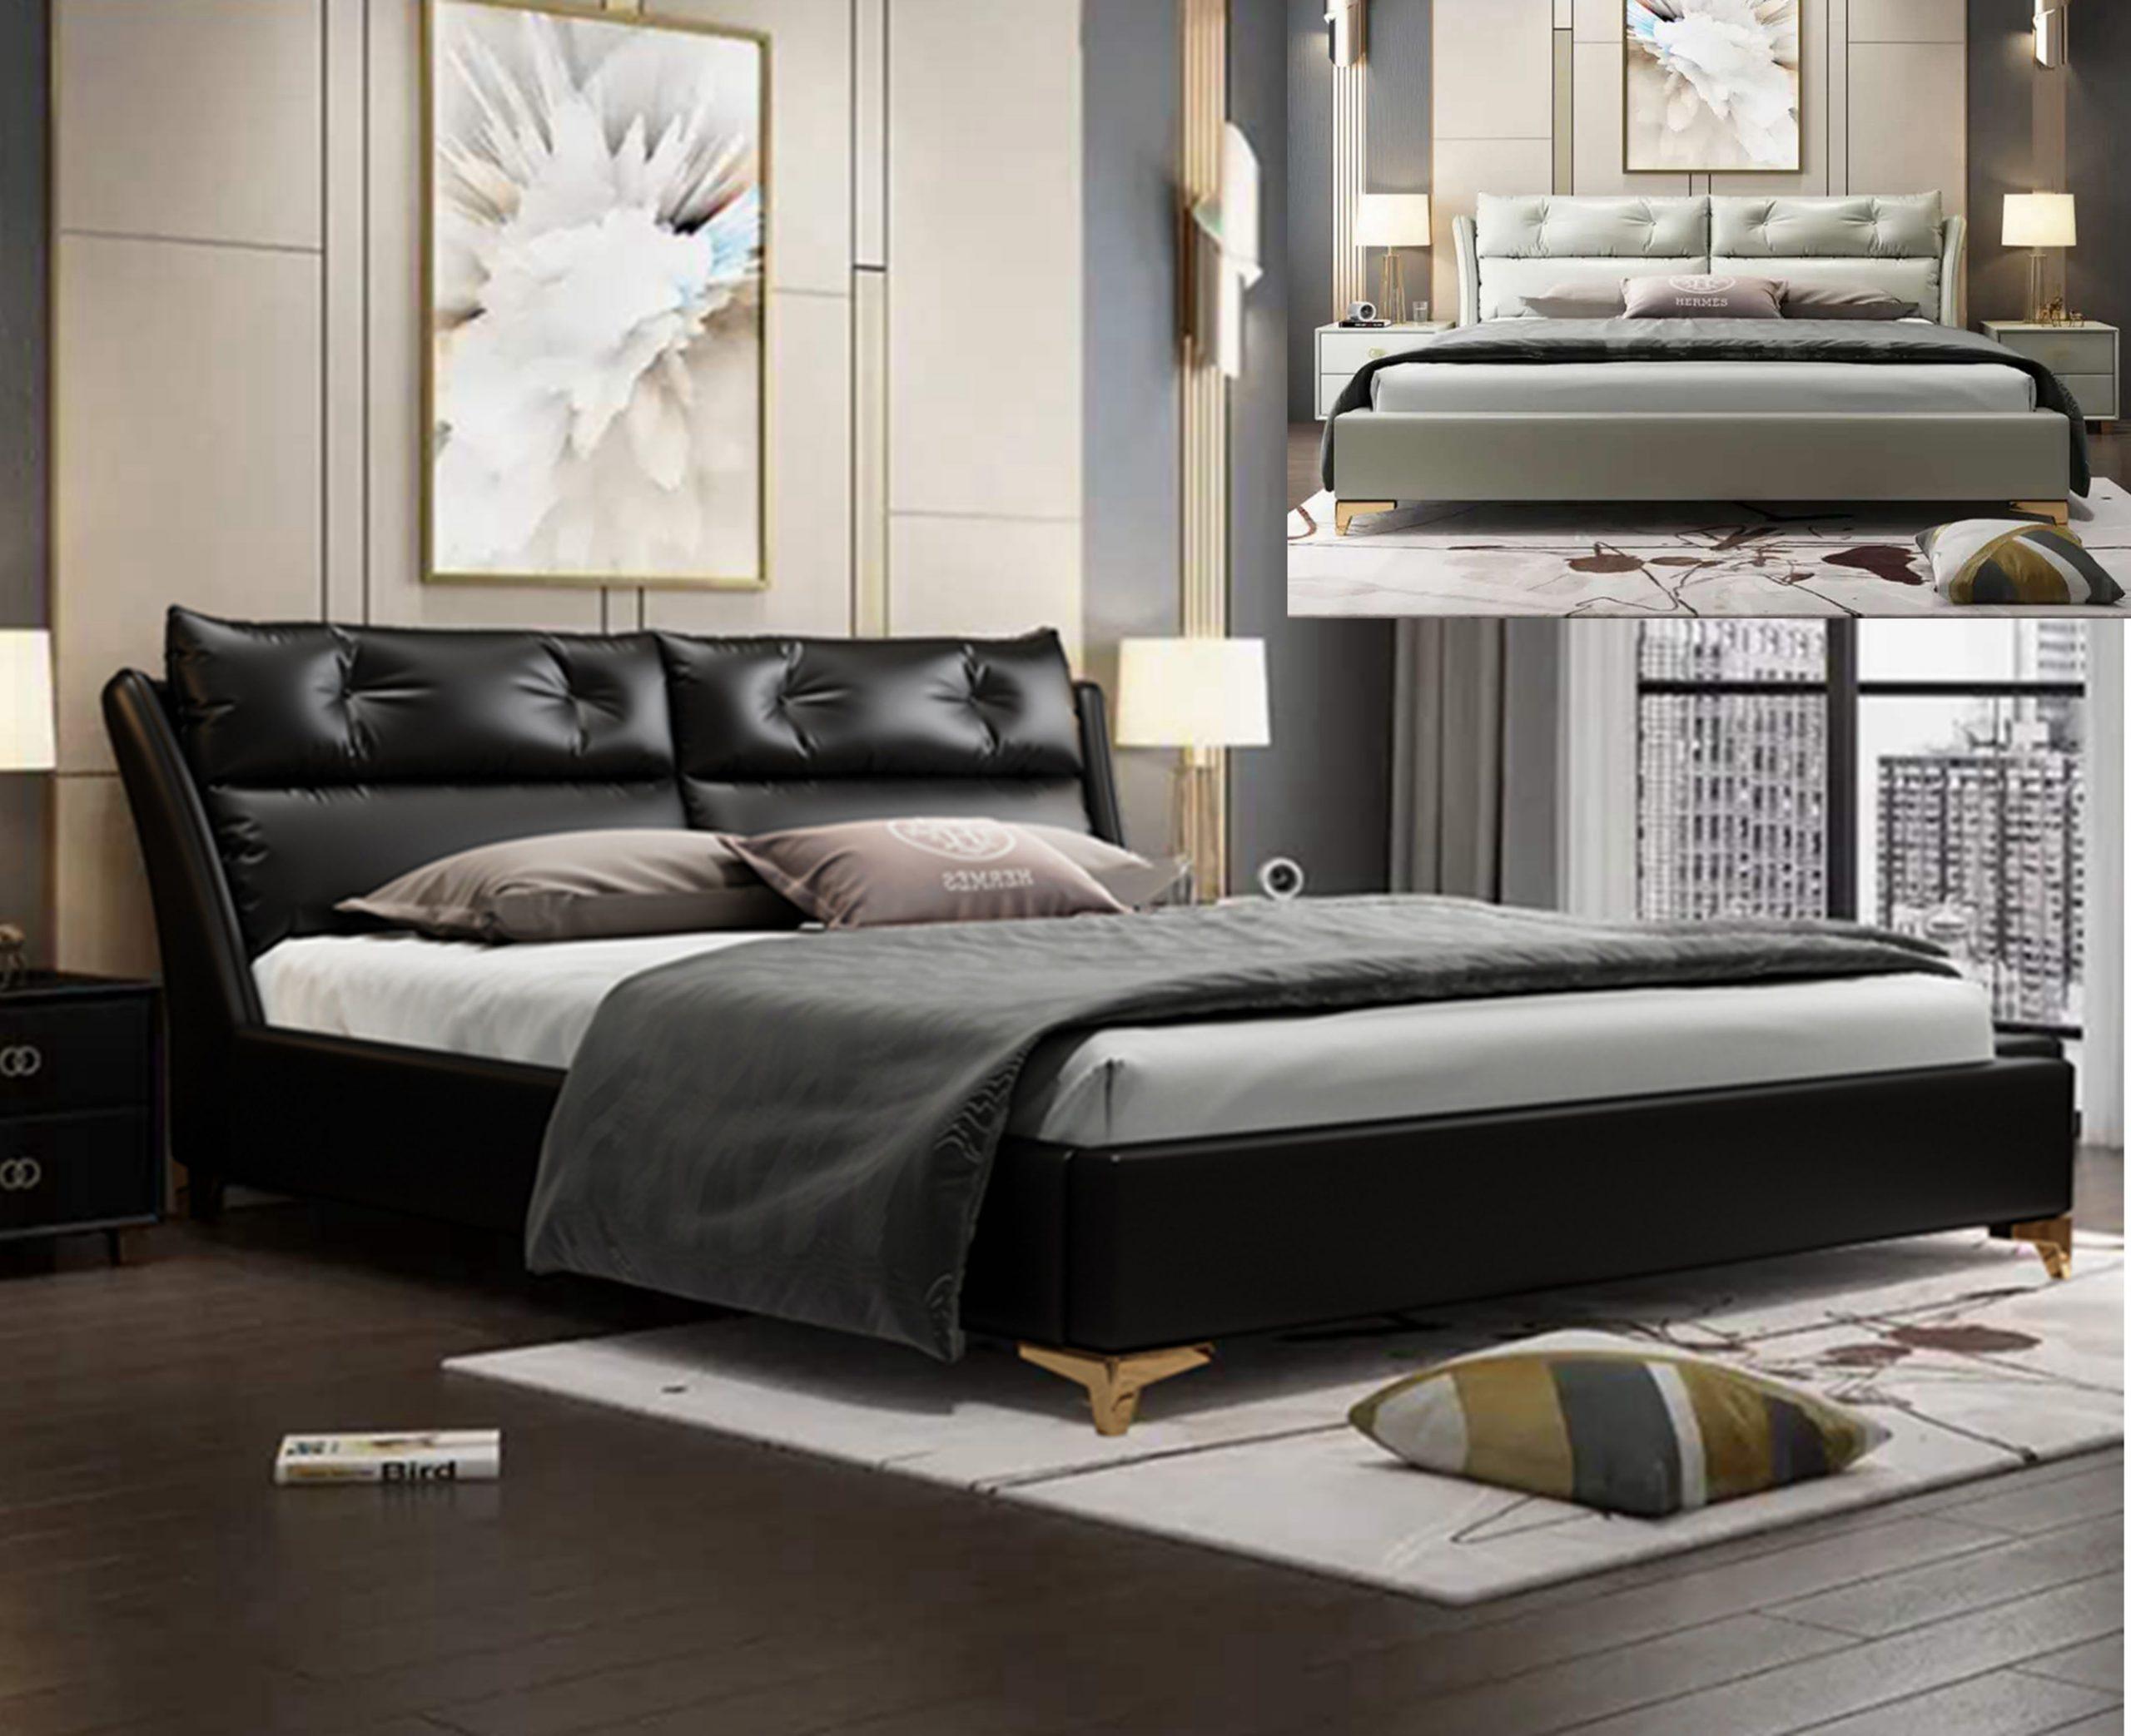 Upholstered Leather Bed China Latest Designs Modern Bedroom Furniture Shop